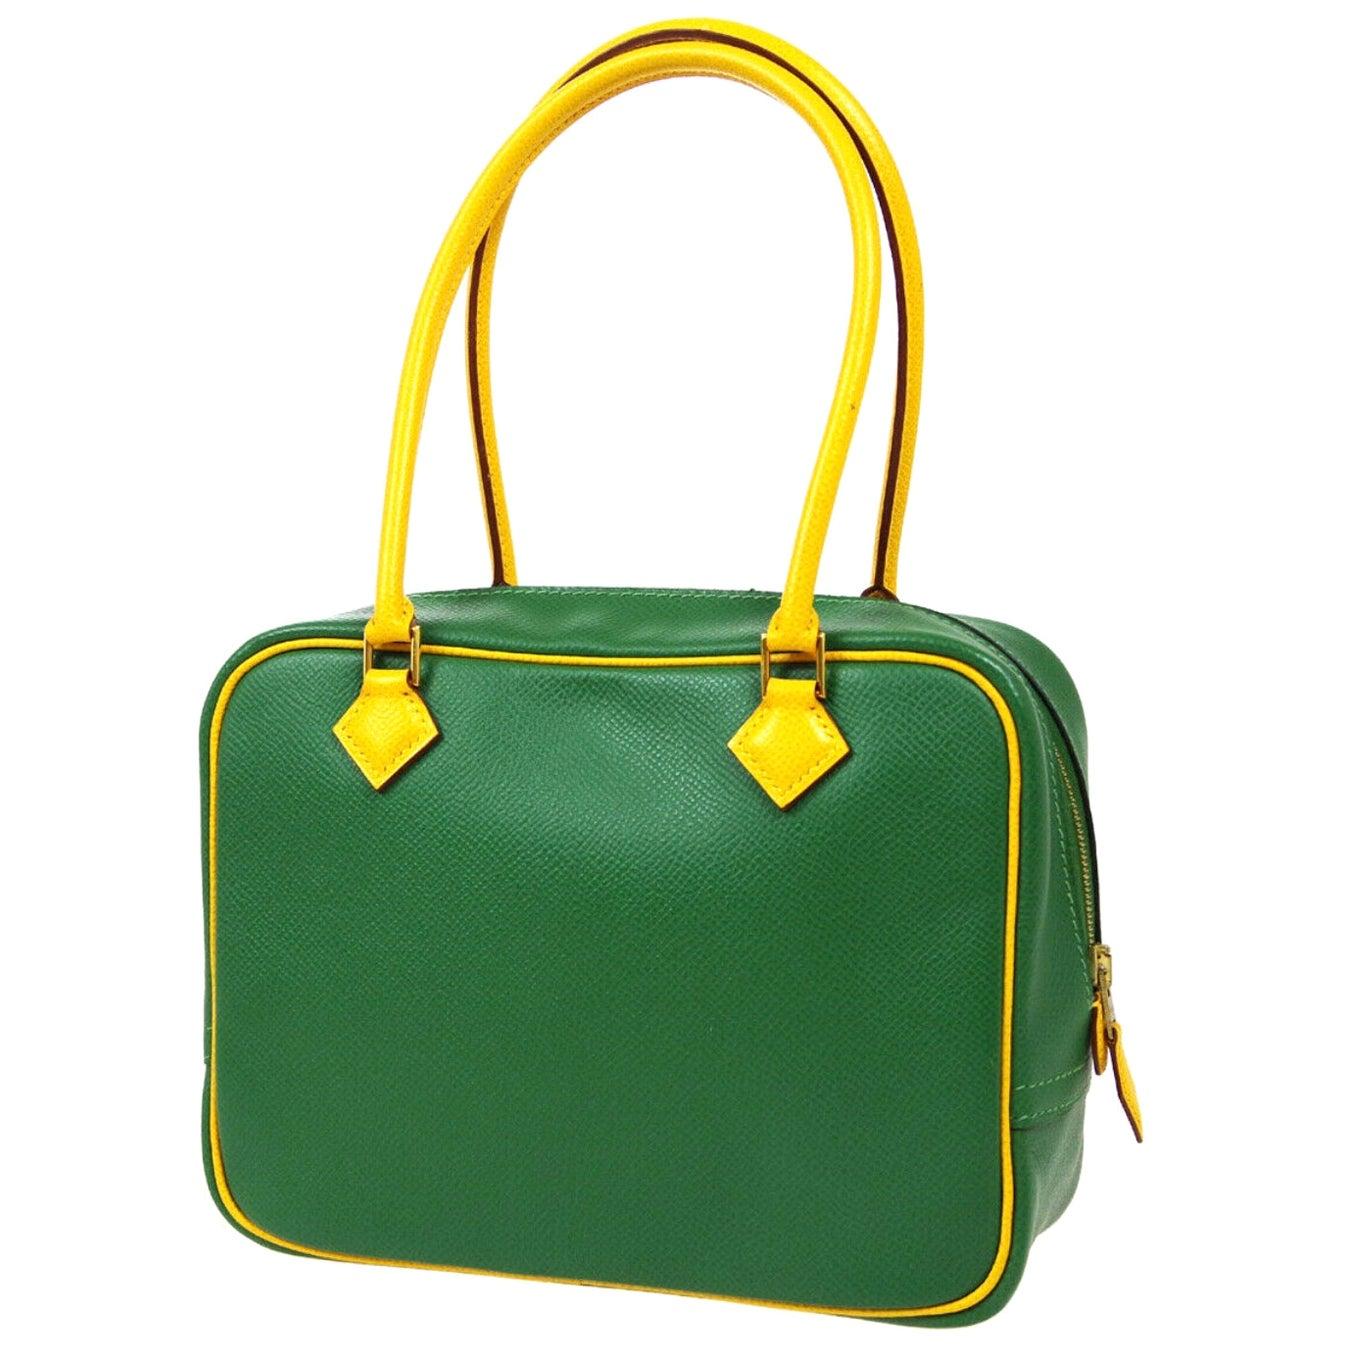 Hermes Green Yellow Leather Gold Evening Top Handle Satchel Bag